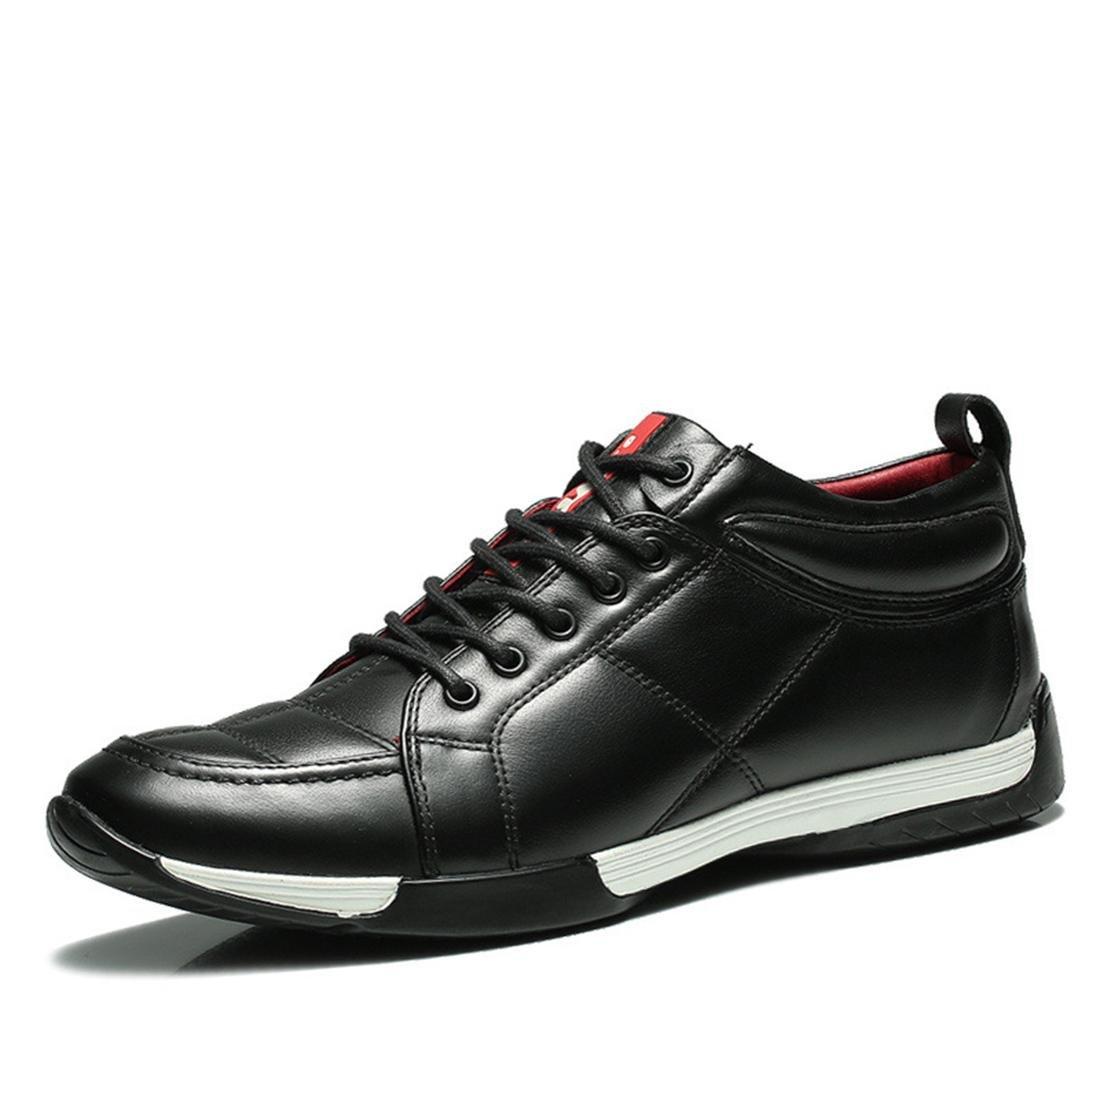 Herren Mode Sportschuhe Freizeit Lederschuhe Lässige Schuhe Trainer Flache Schuhe Rutschfest Licht Gemütlich Laufschuhe EUR GRÖSSE 38-44